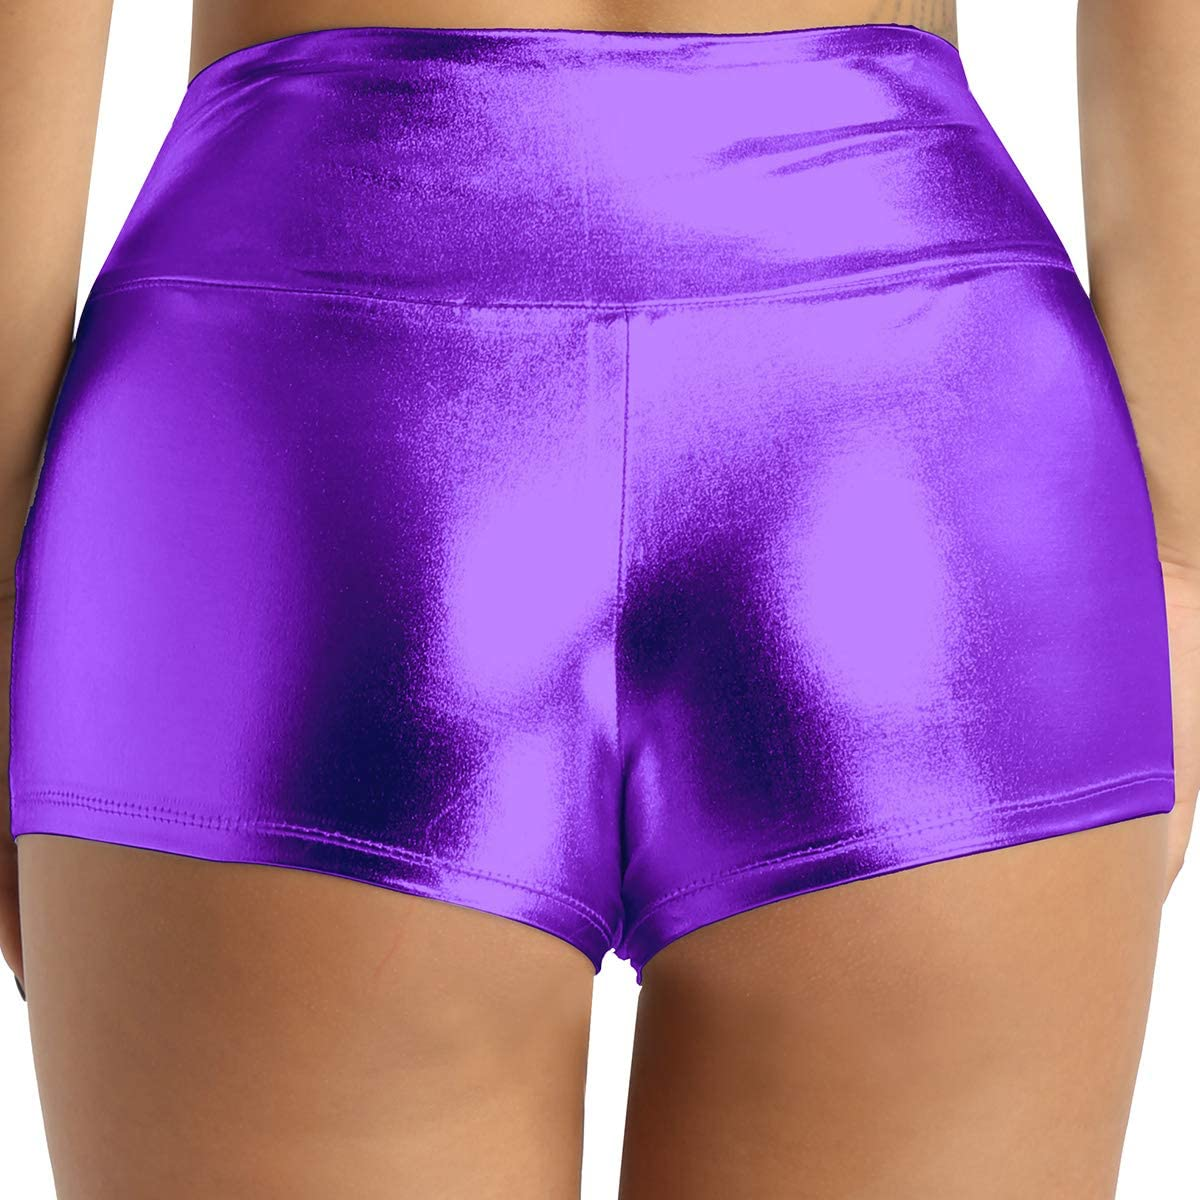 iEFiEL Women's Shiny Metallic High Waisted Booty Shorts Boyshort Dance Hot Pants Purple